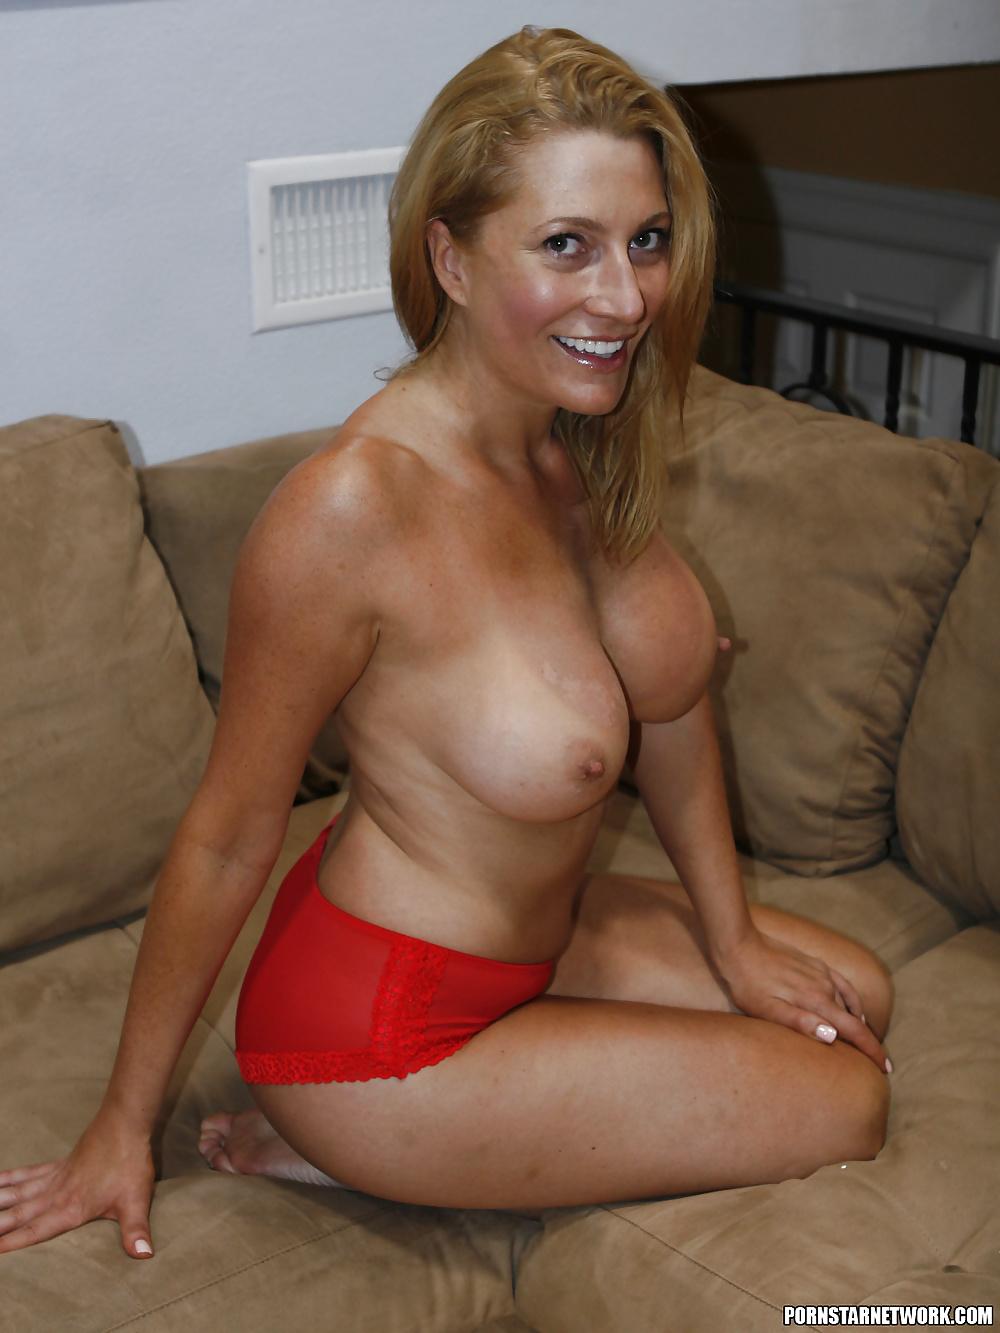 Josephine James Milf Nude Adult Photos